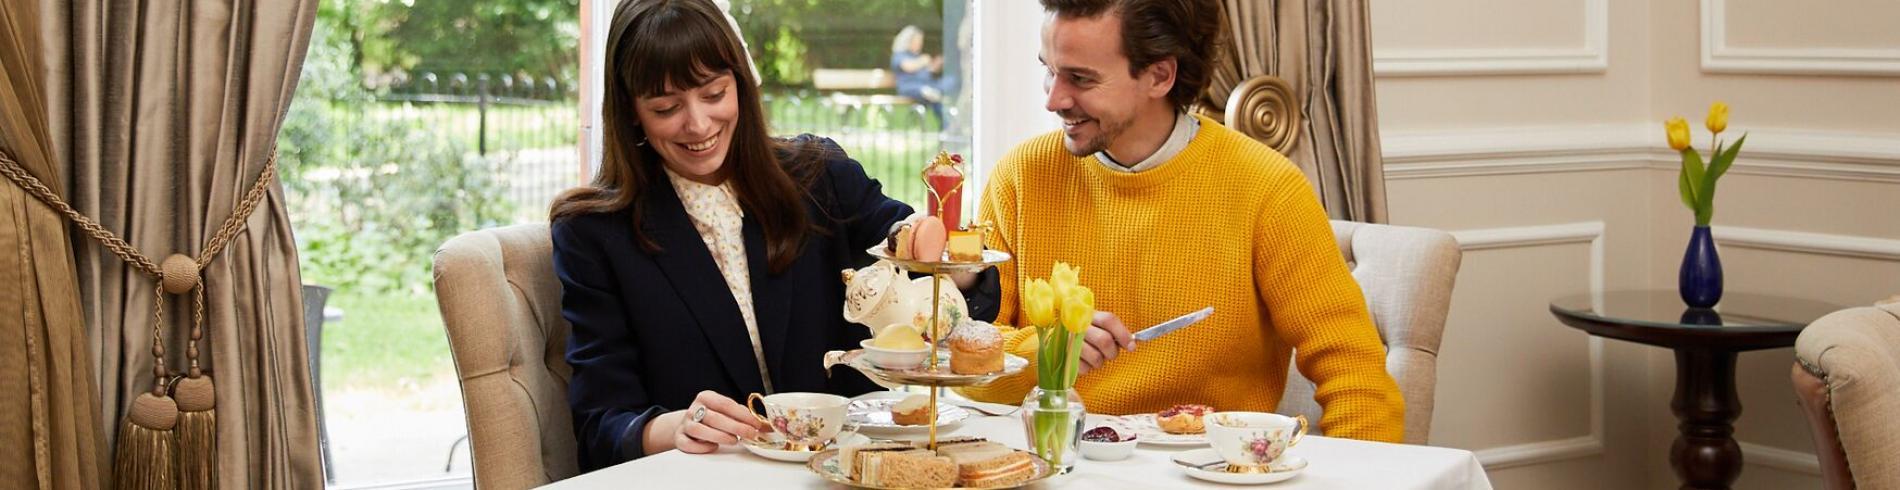 couple having afternoon tea